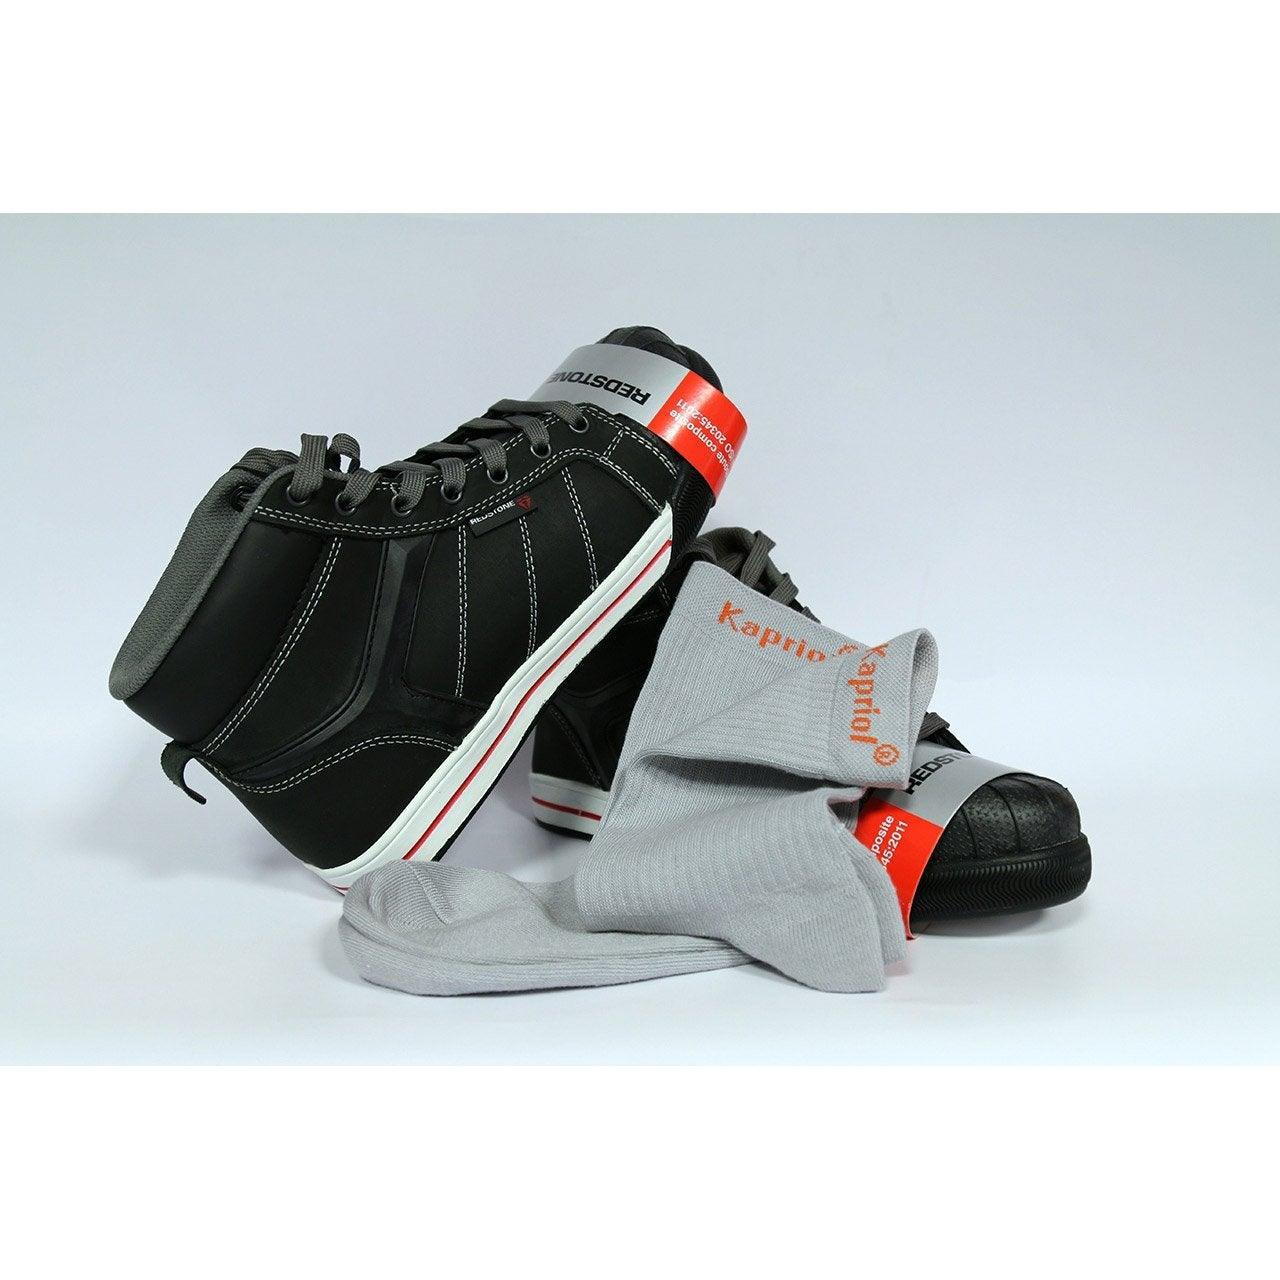 Merlin Leroy Chaussure De Securite Chaussure NwvmO8n0